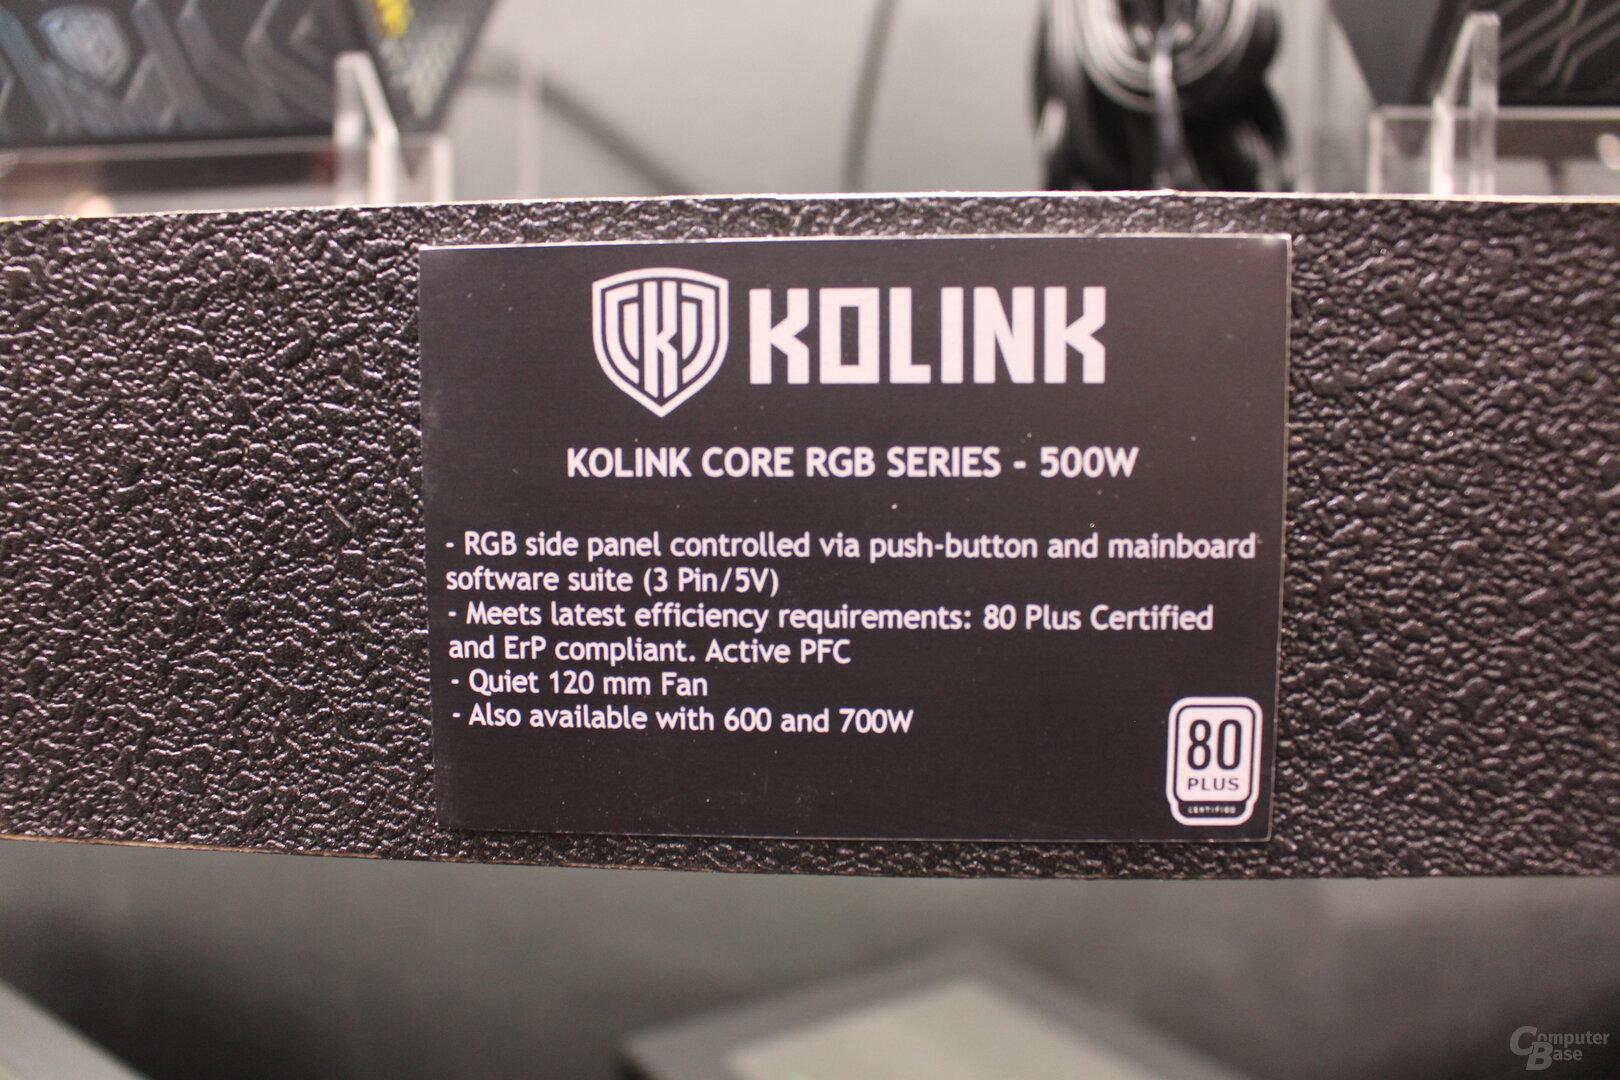 Kolink Core RGB Series